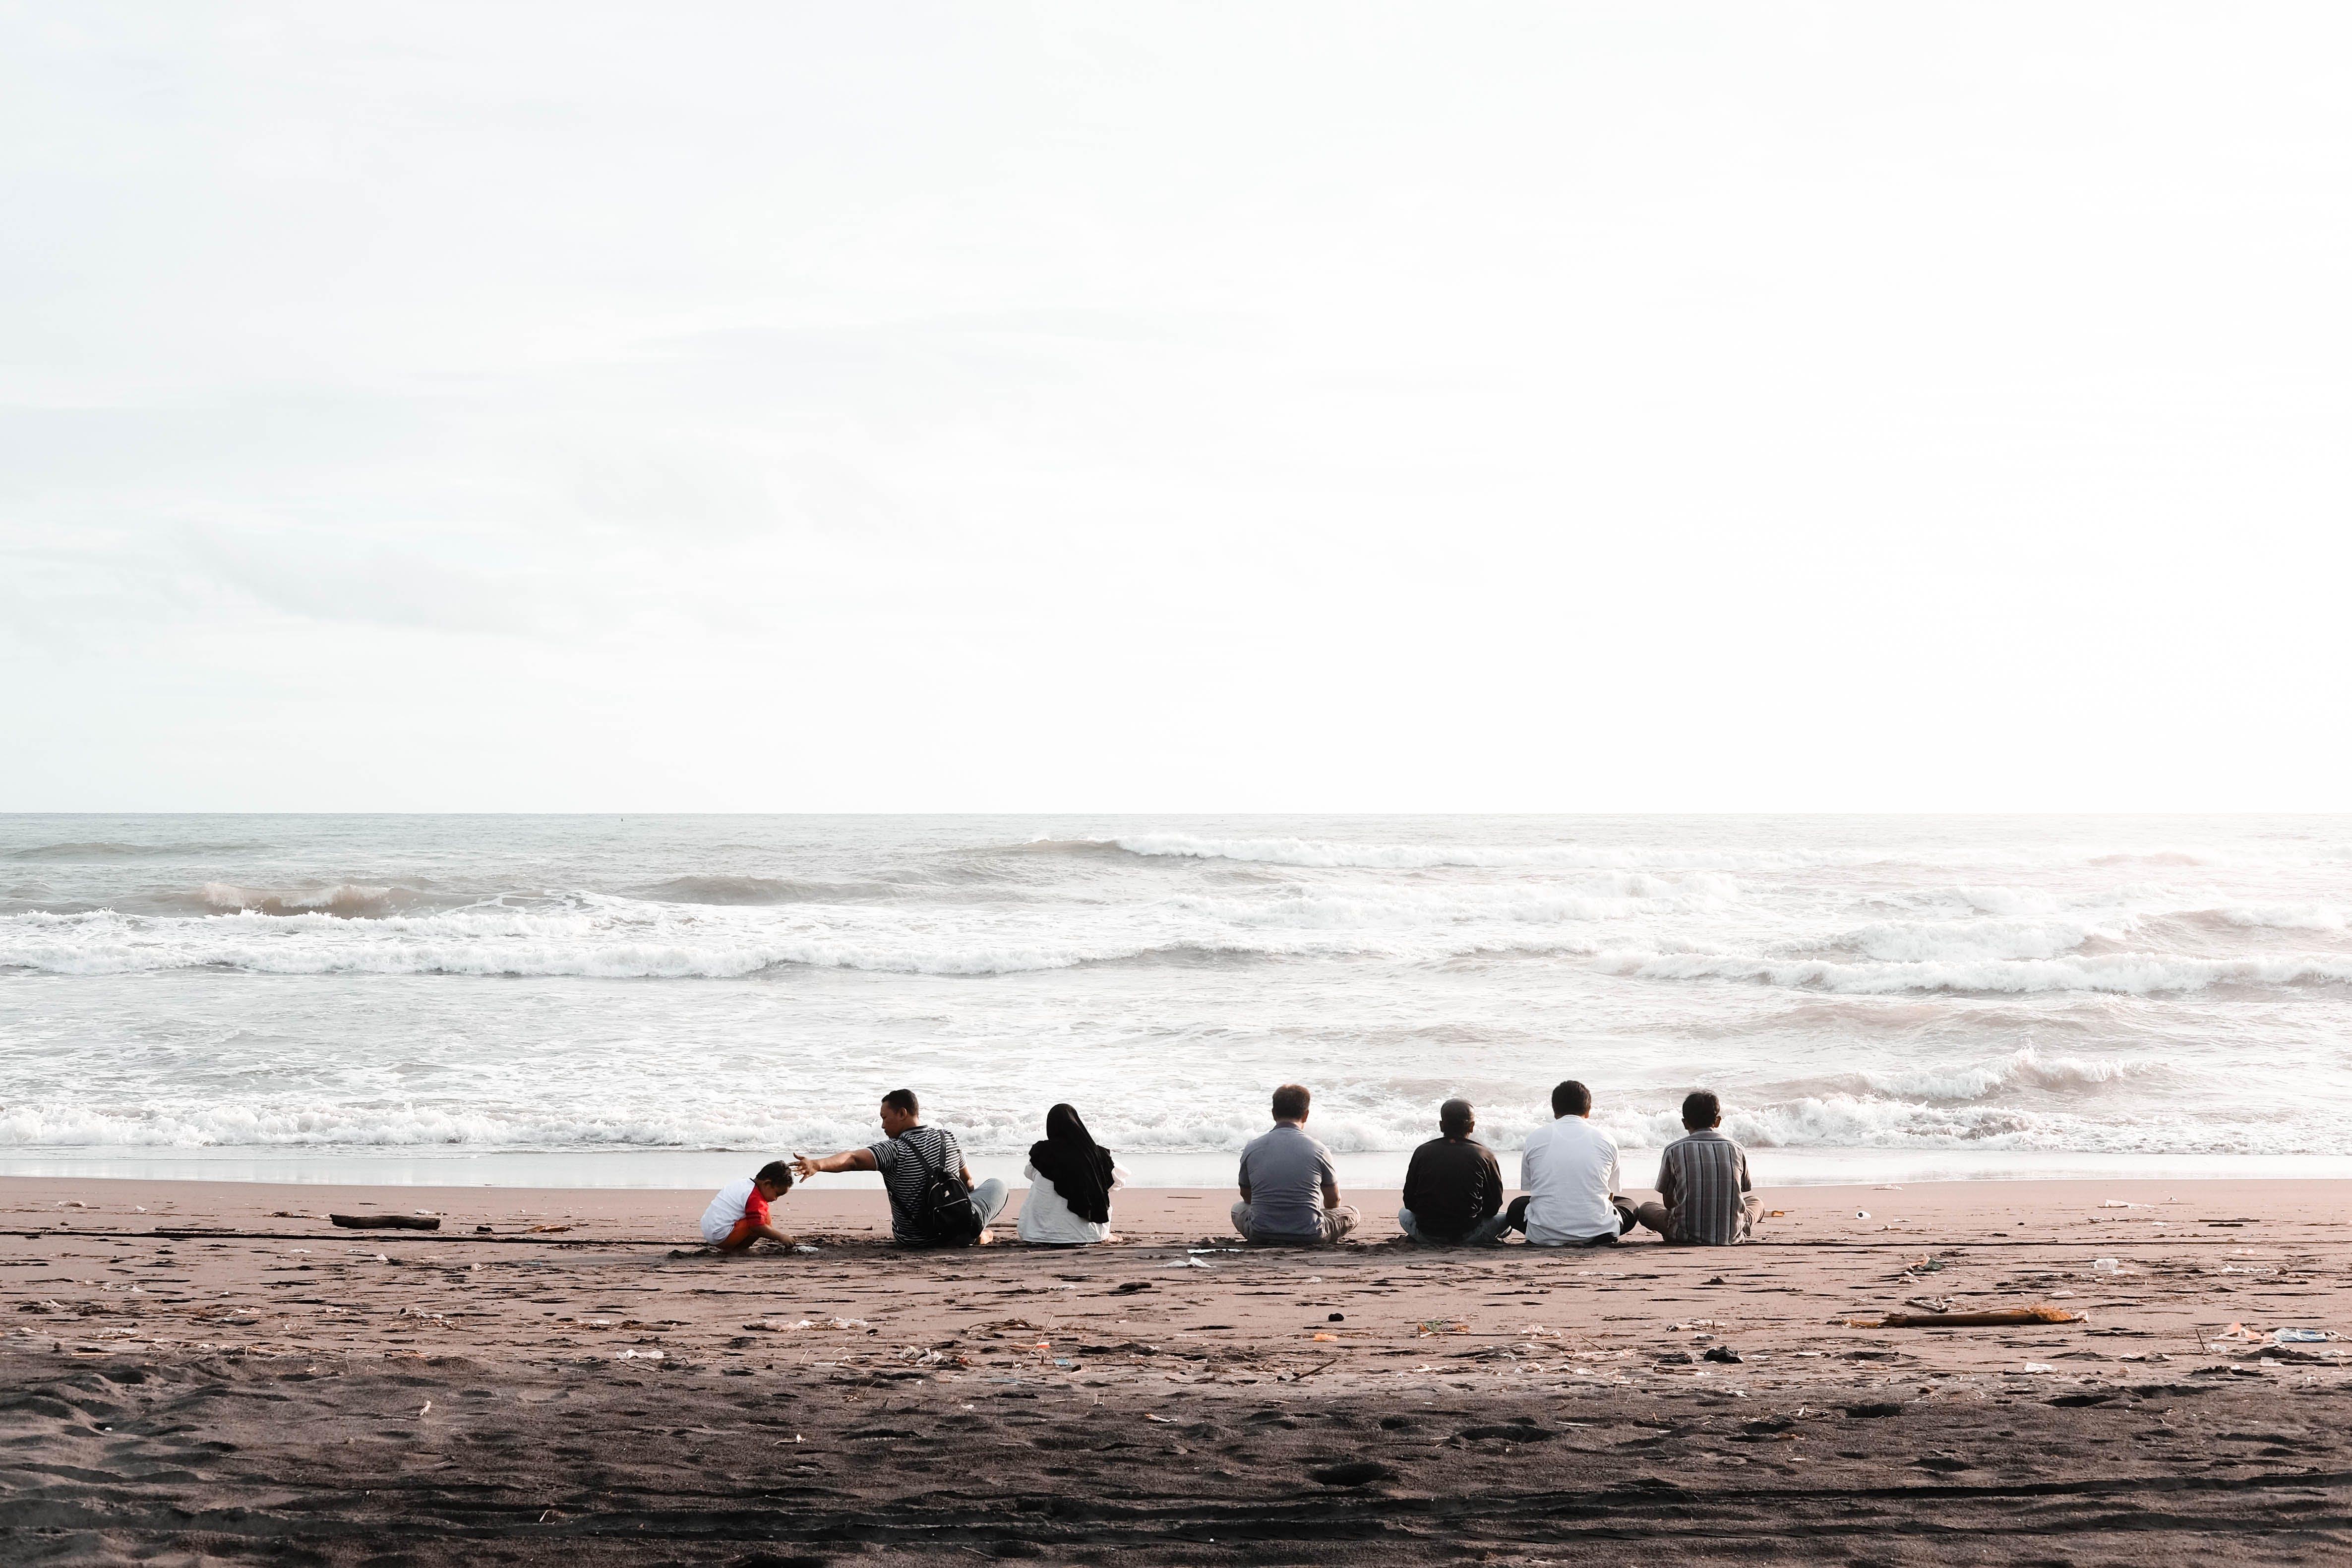 Group of People Sitting on Seashore